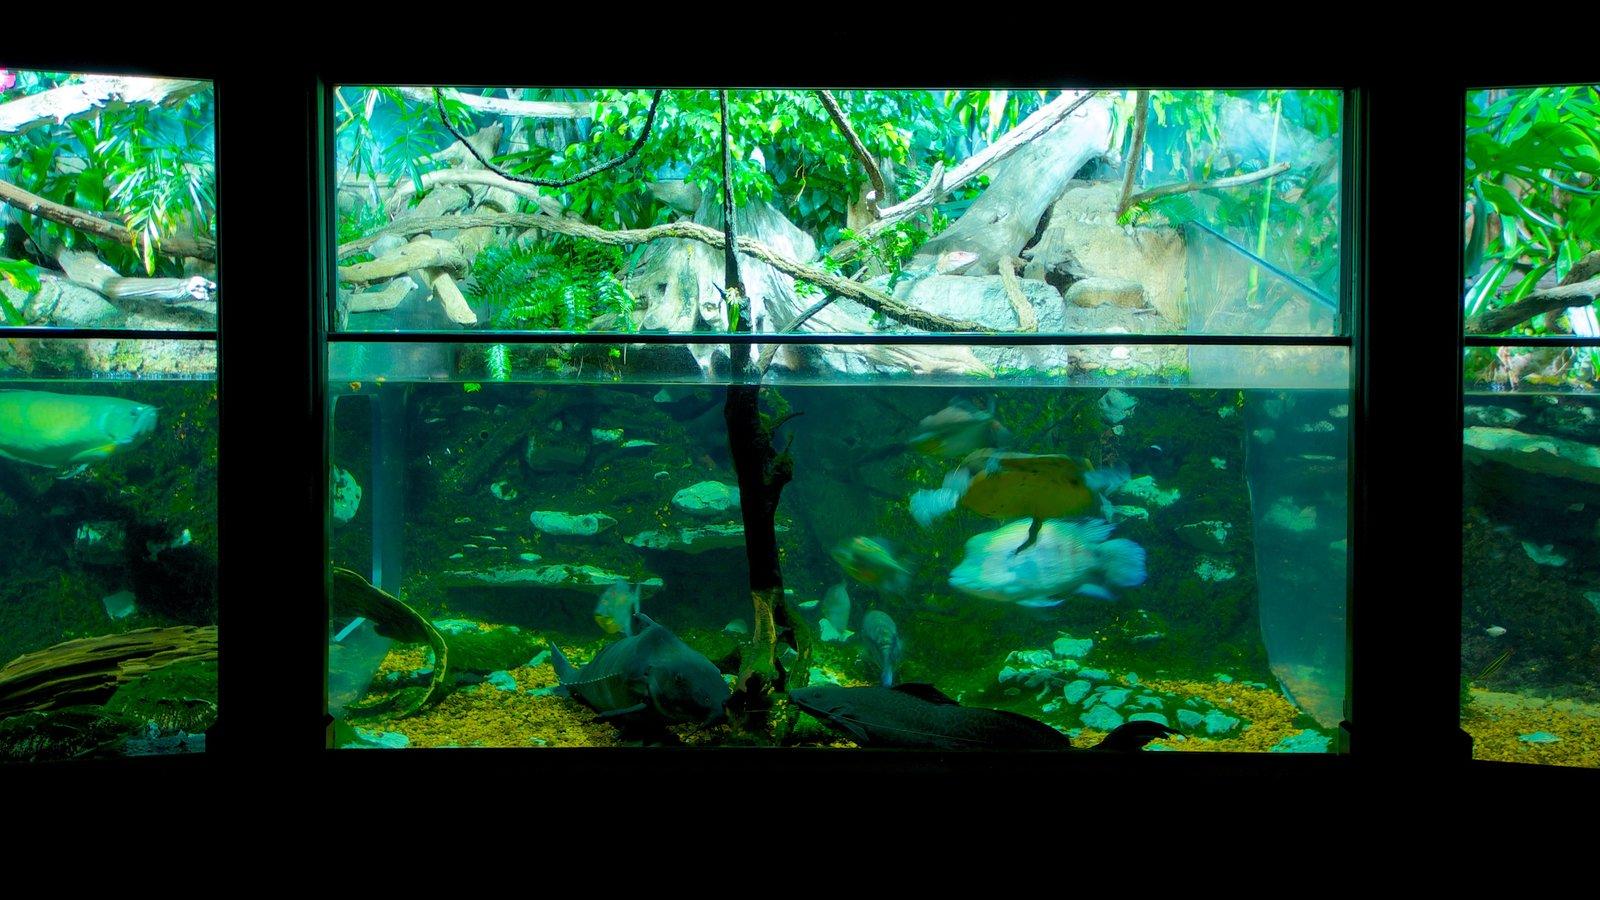 Nashville Zoo featuring marine life, interior views and zoo animals